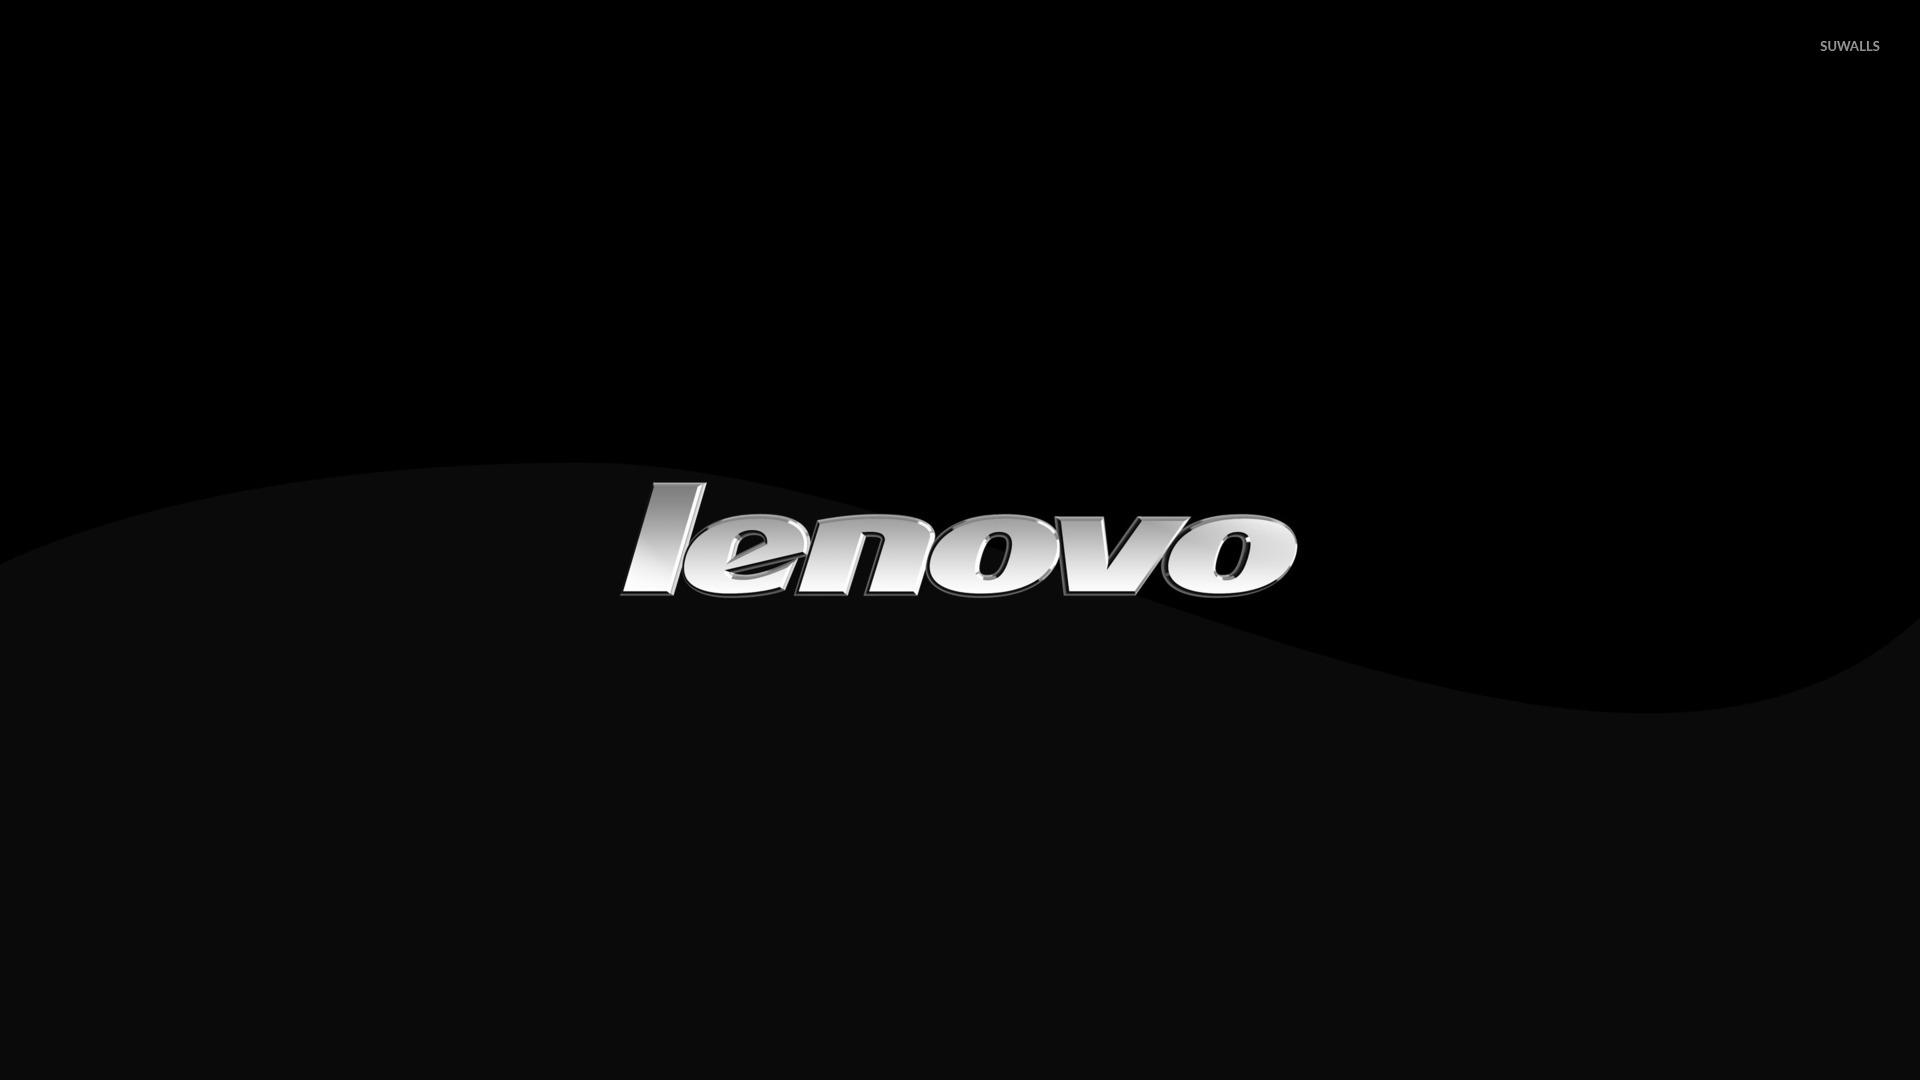 Lenovo wallpaper 1920x1080 1920x1080